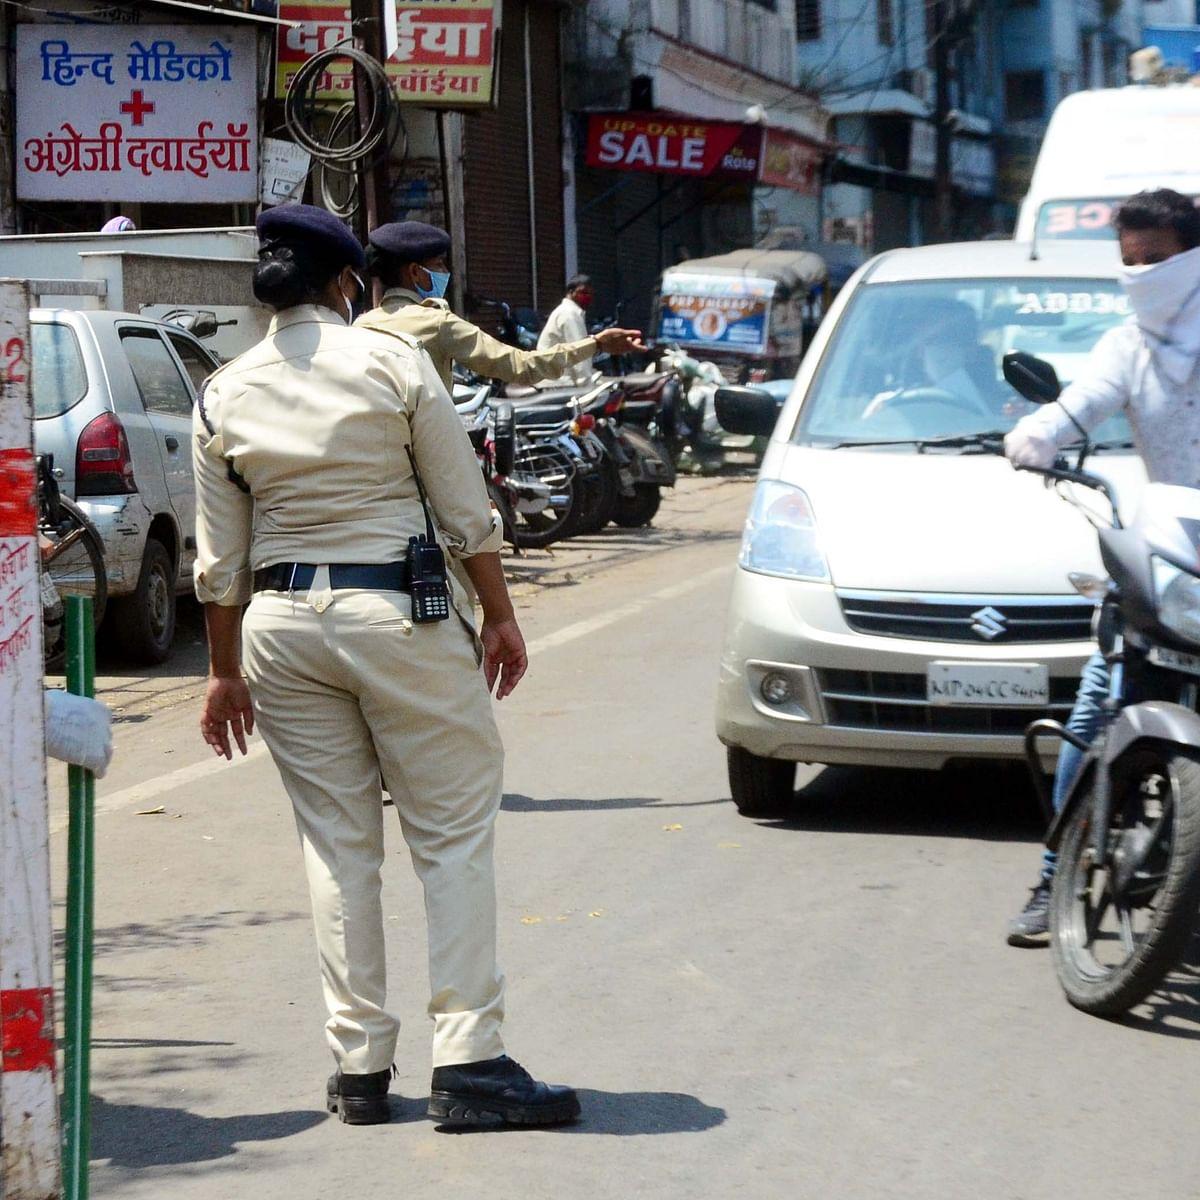 Is your area in Bengaluru a hotspot? Full list of coronavirus hotspots in city